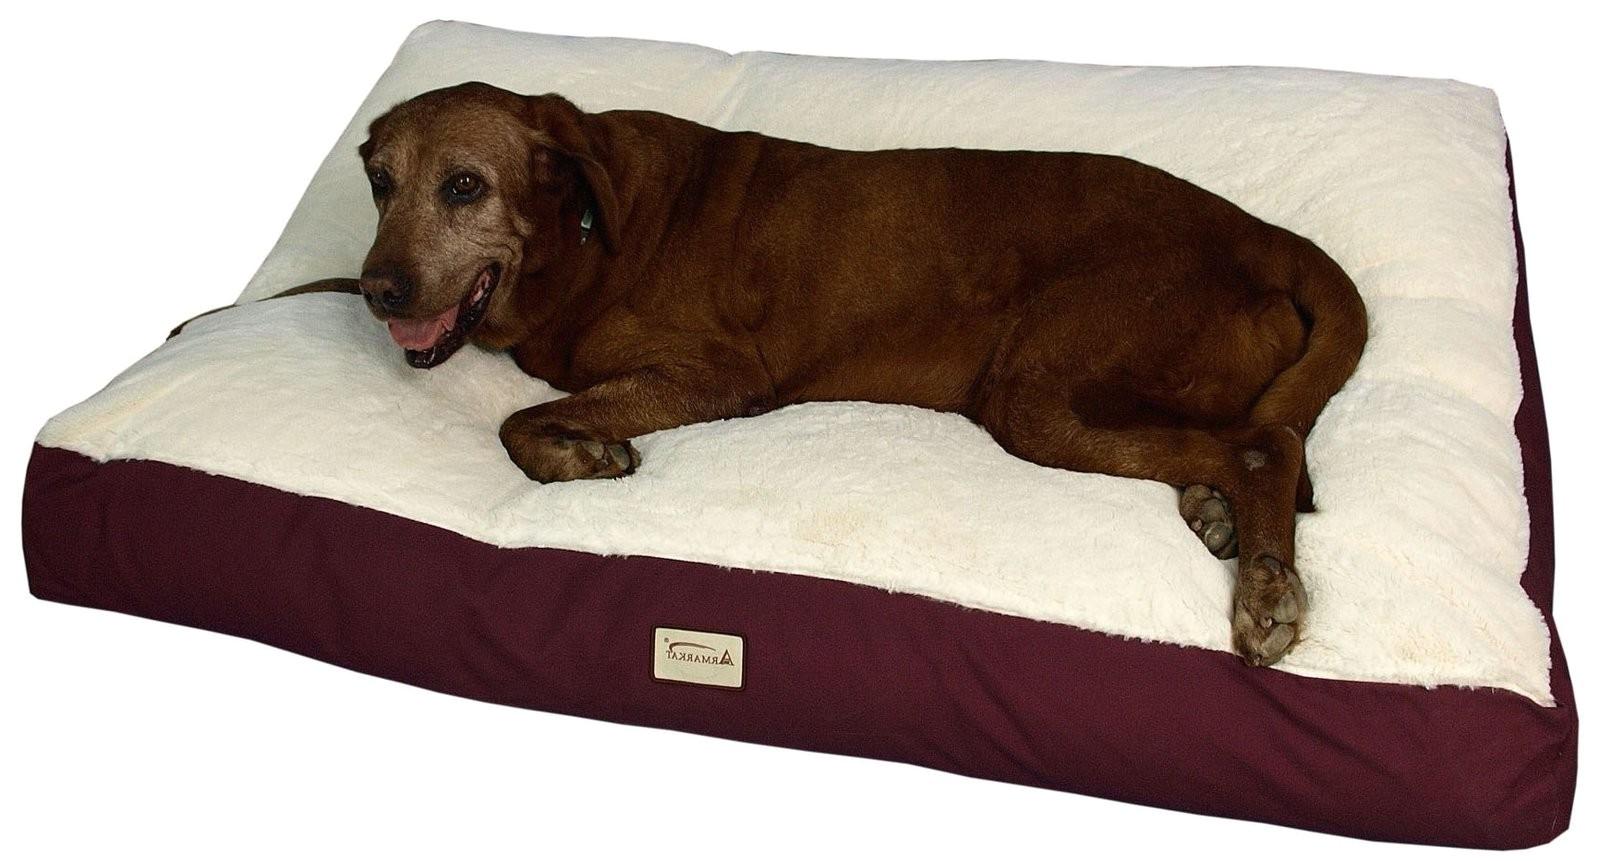 replacement dog bed filler liner for ellie bo large inch cage dog 63e63c008ba17dd6